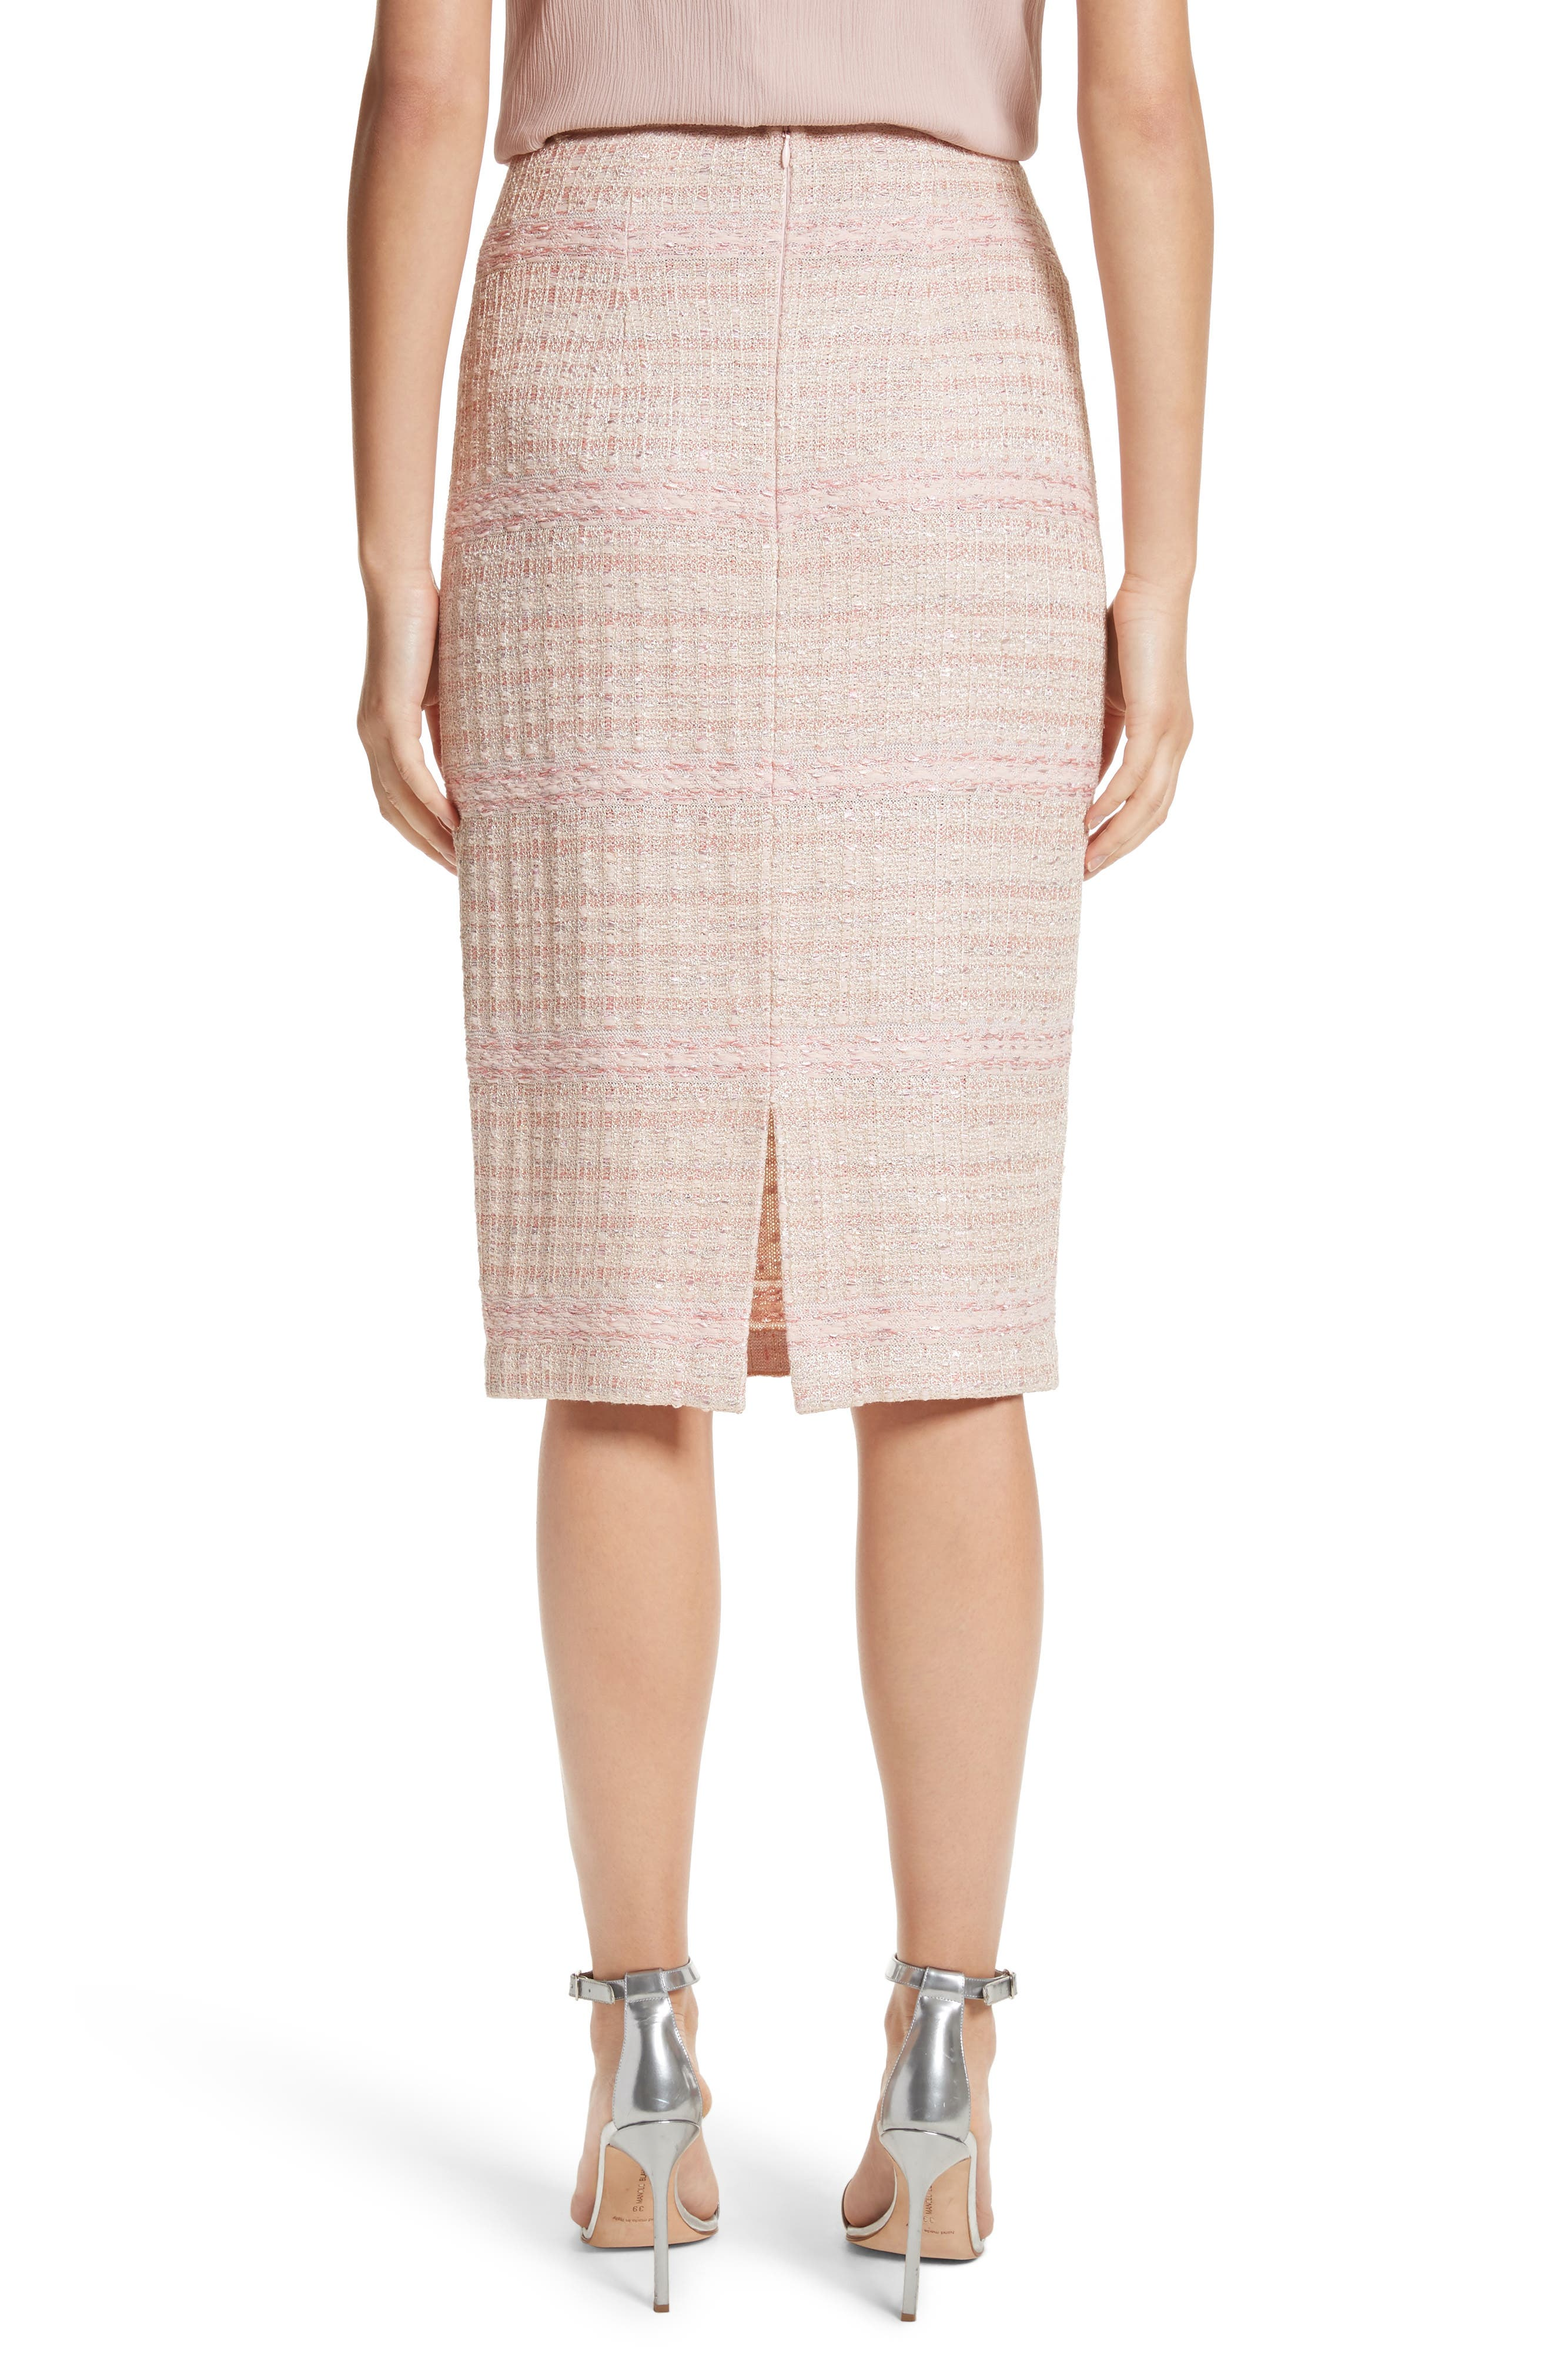 Alternate Image 2  - St. John Collection Guilded Pastel Knit Skirt